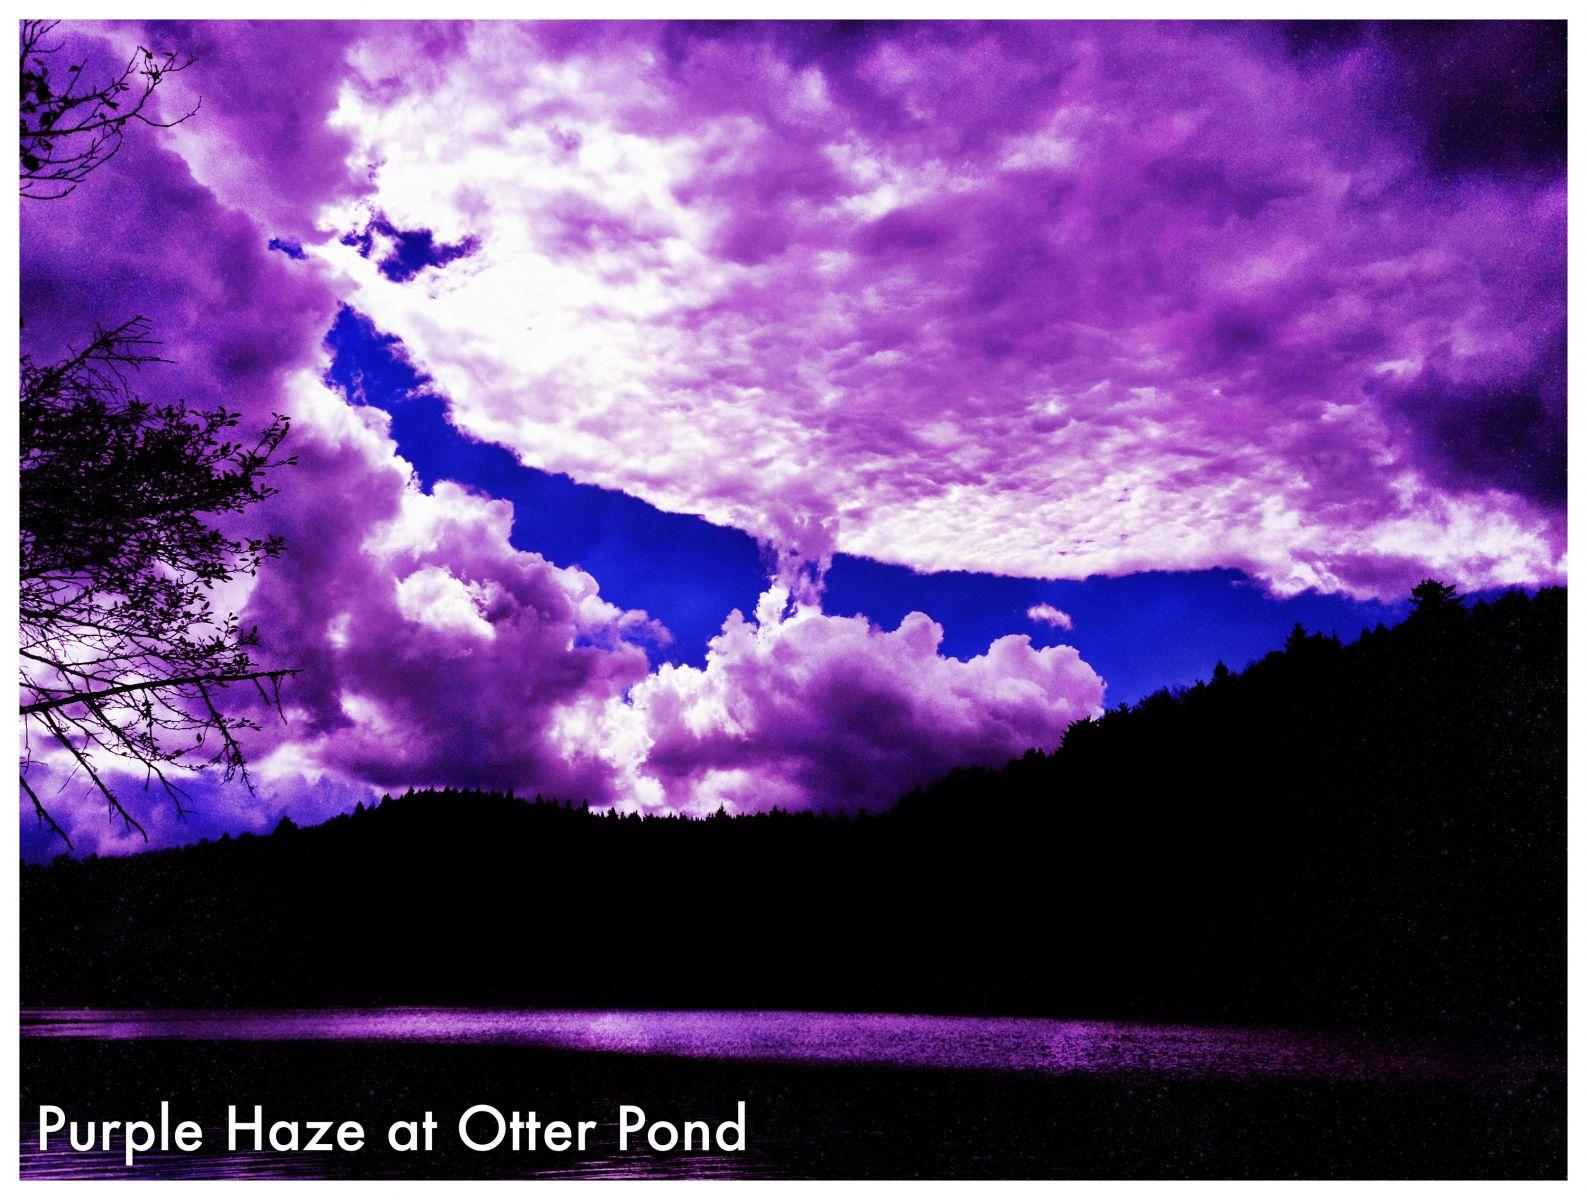 Purple Haze at Otter Pond